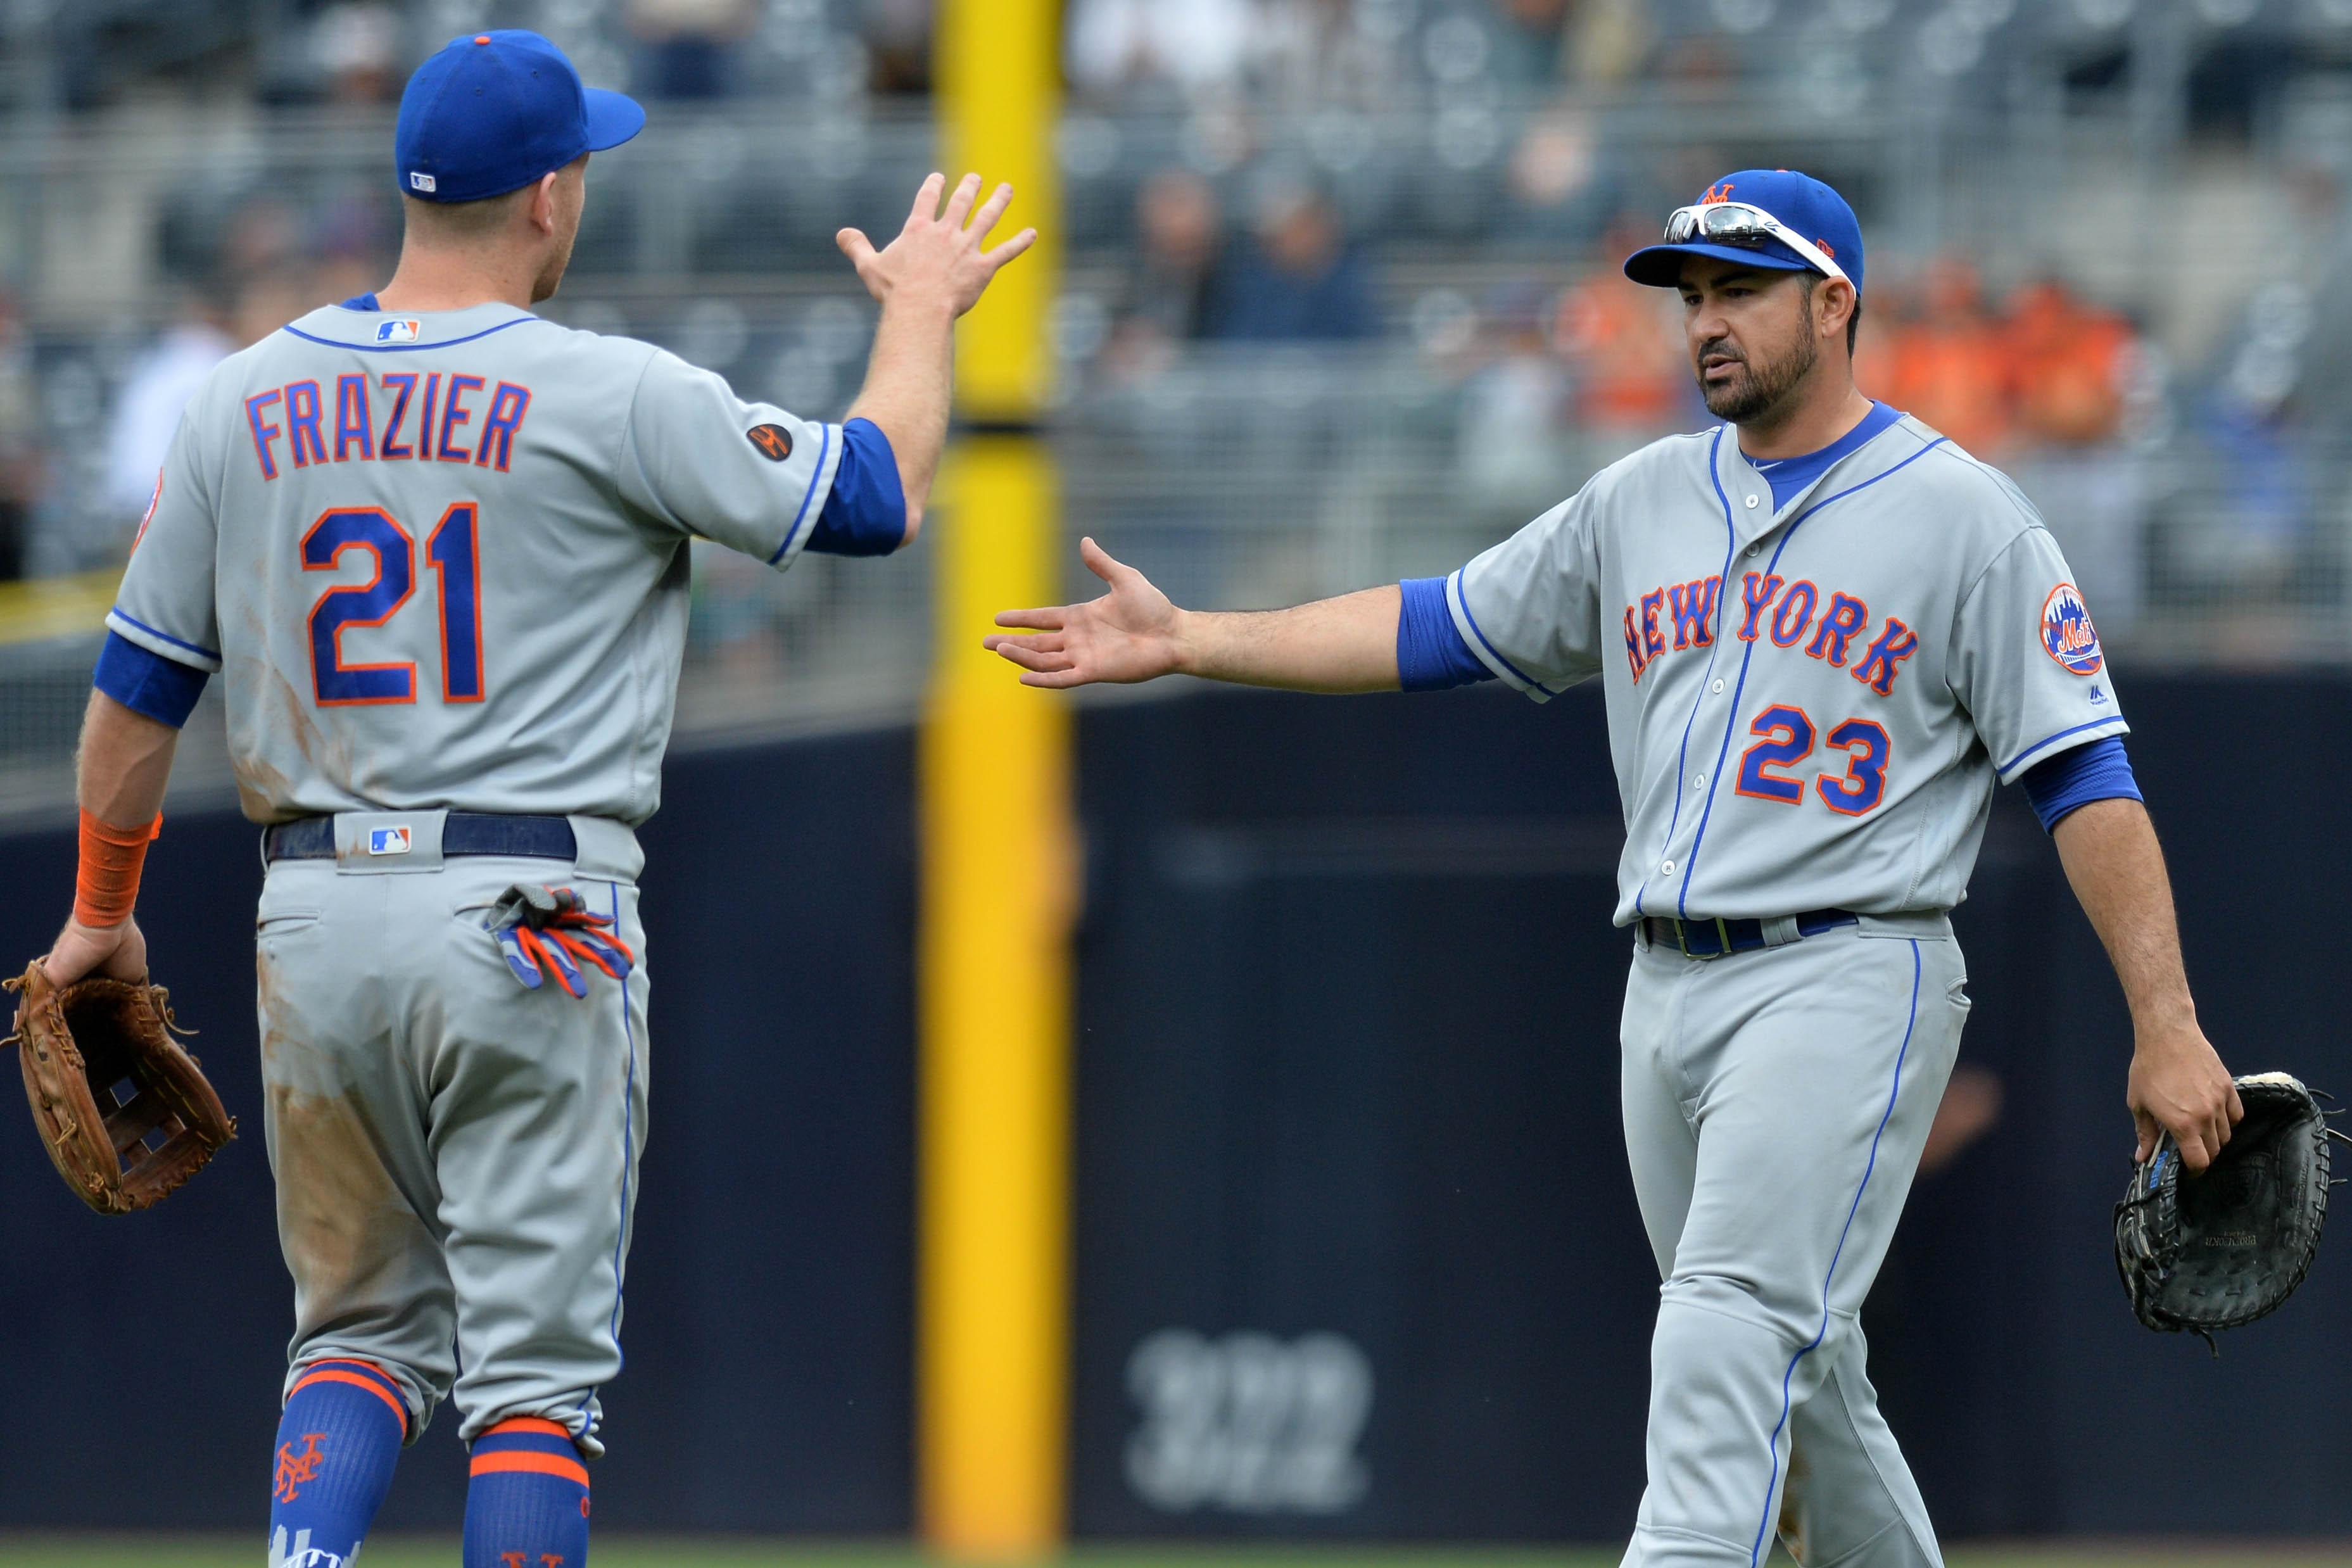 5/1/18 Game Preview: Atlanta Braves at New York Mets